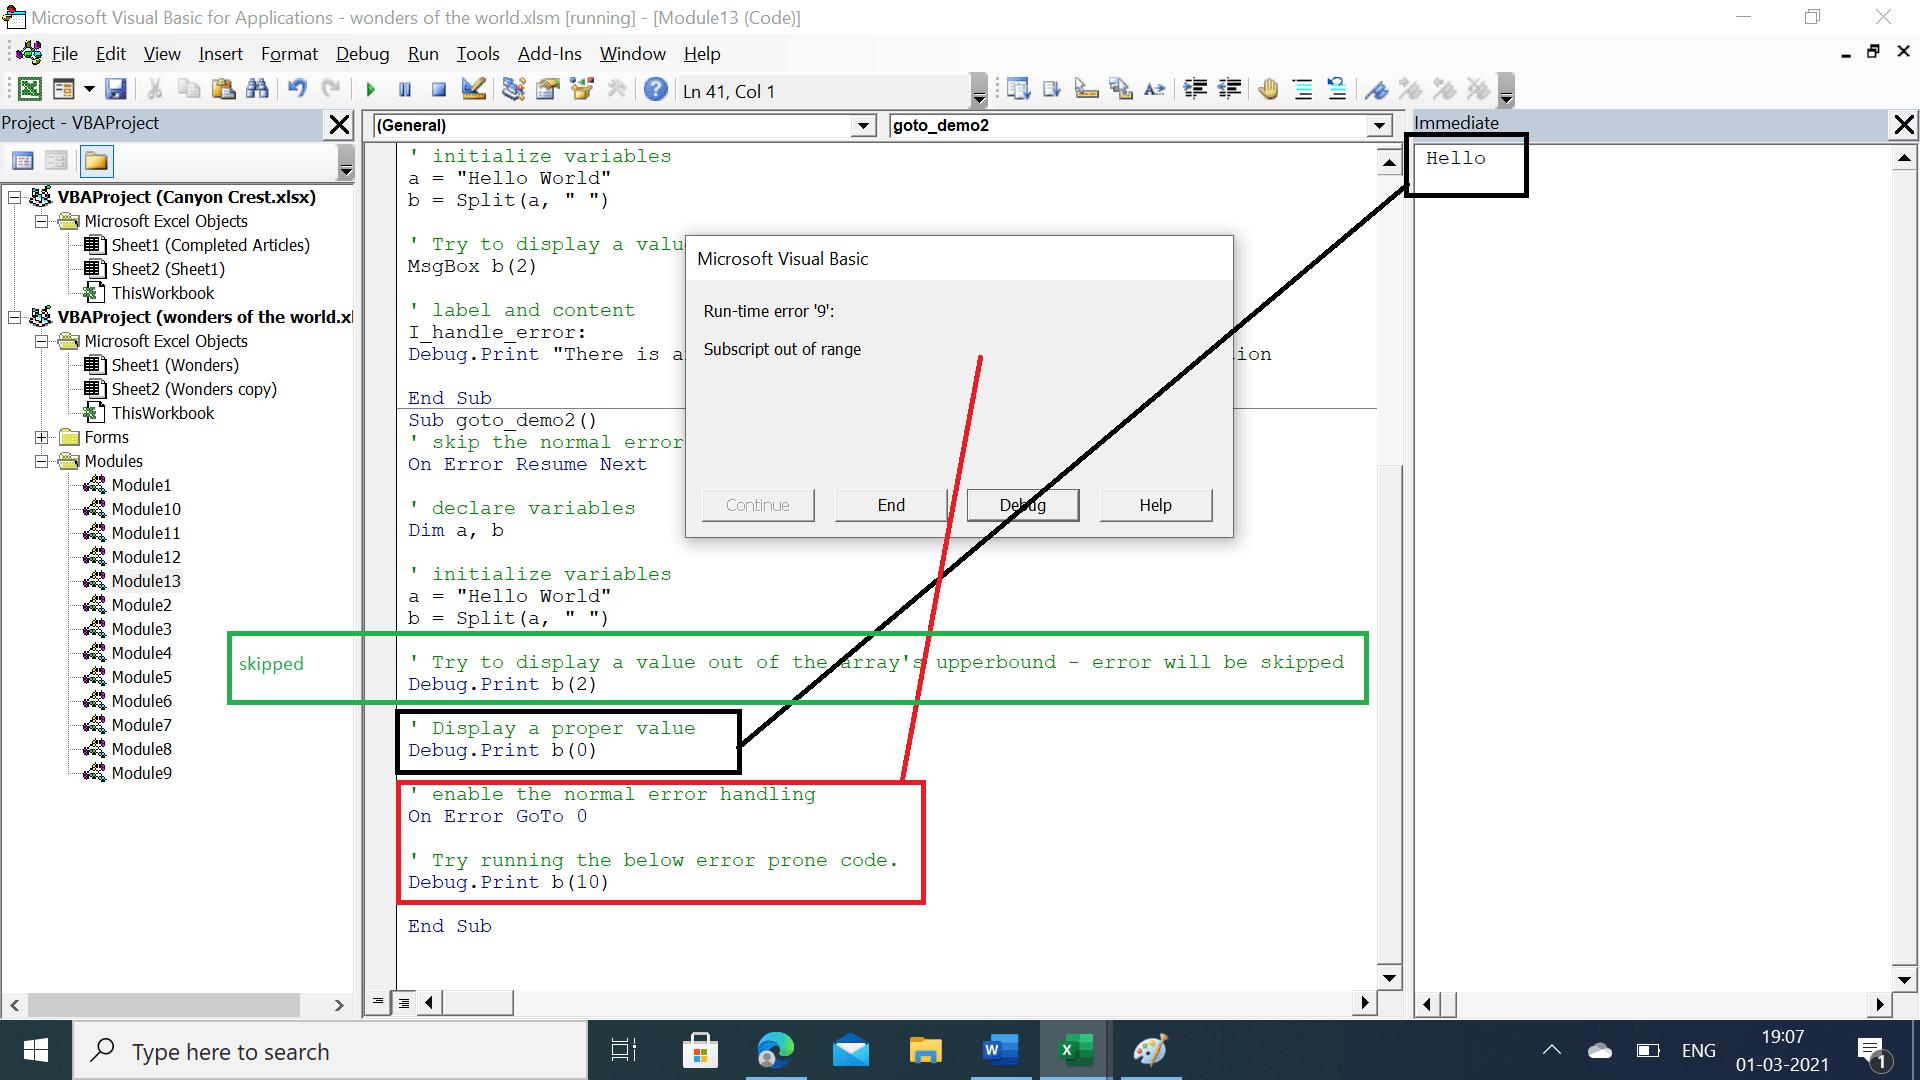 Run-time error '9': Subscript out of range error popup.